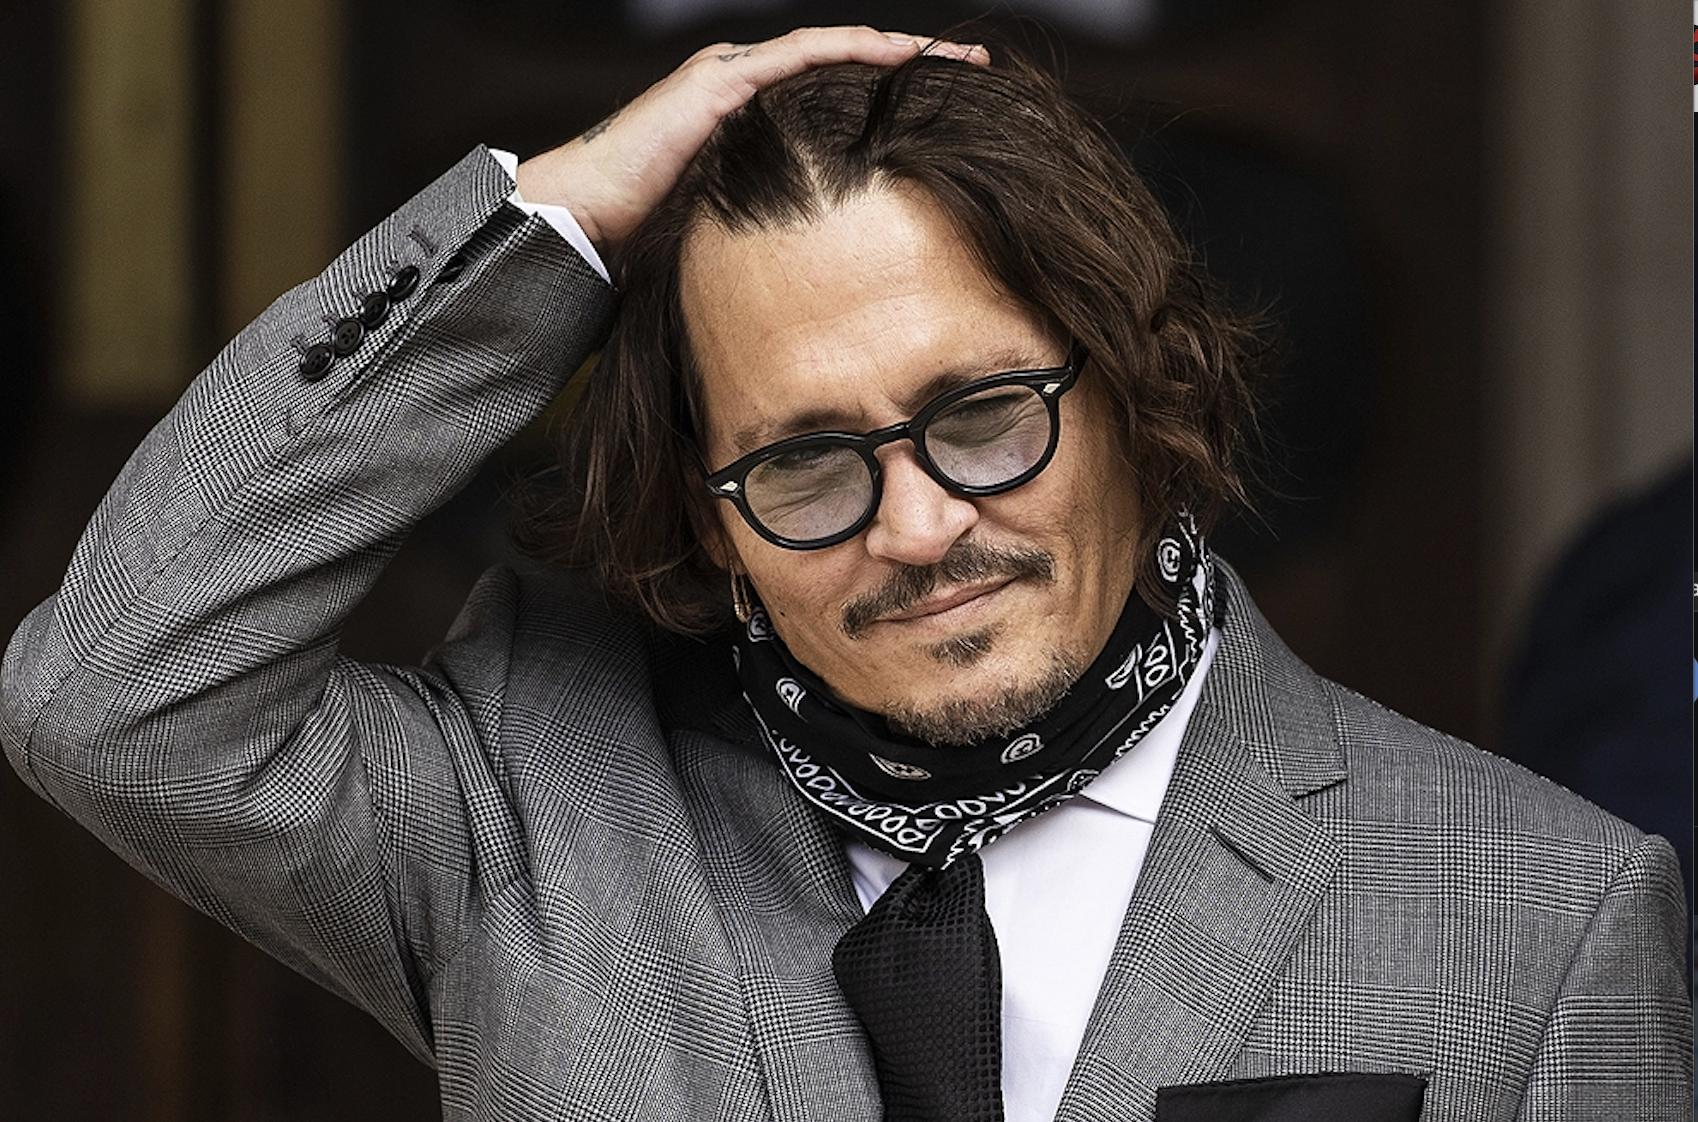 Johnny Depp Blasts Cancel Culture